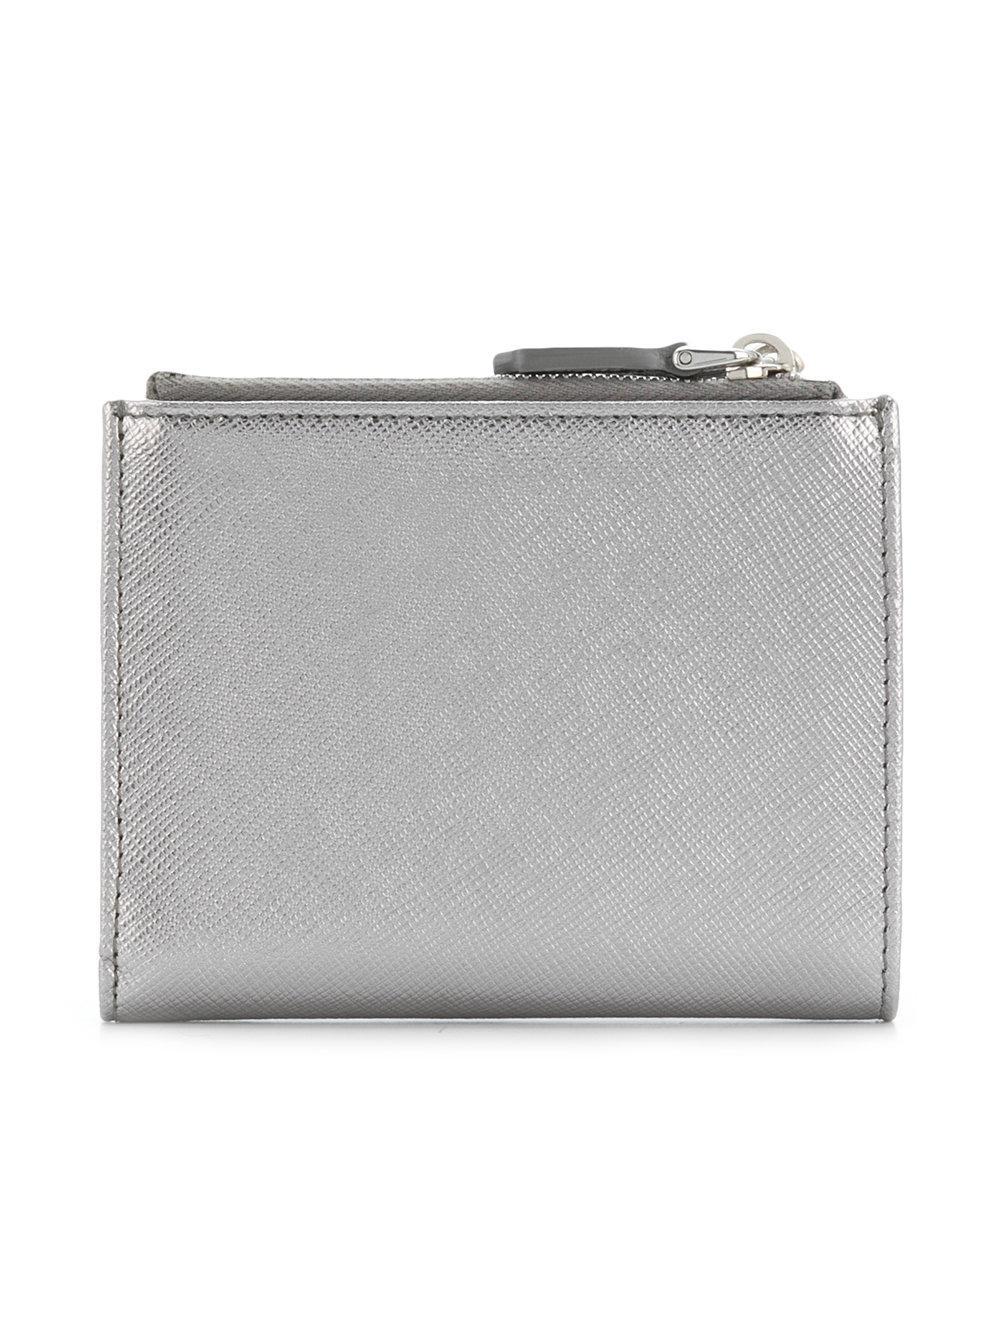 0356350a2430 Lyst - Prada Logo Plaque Bifold Wallet in Metallic